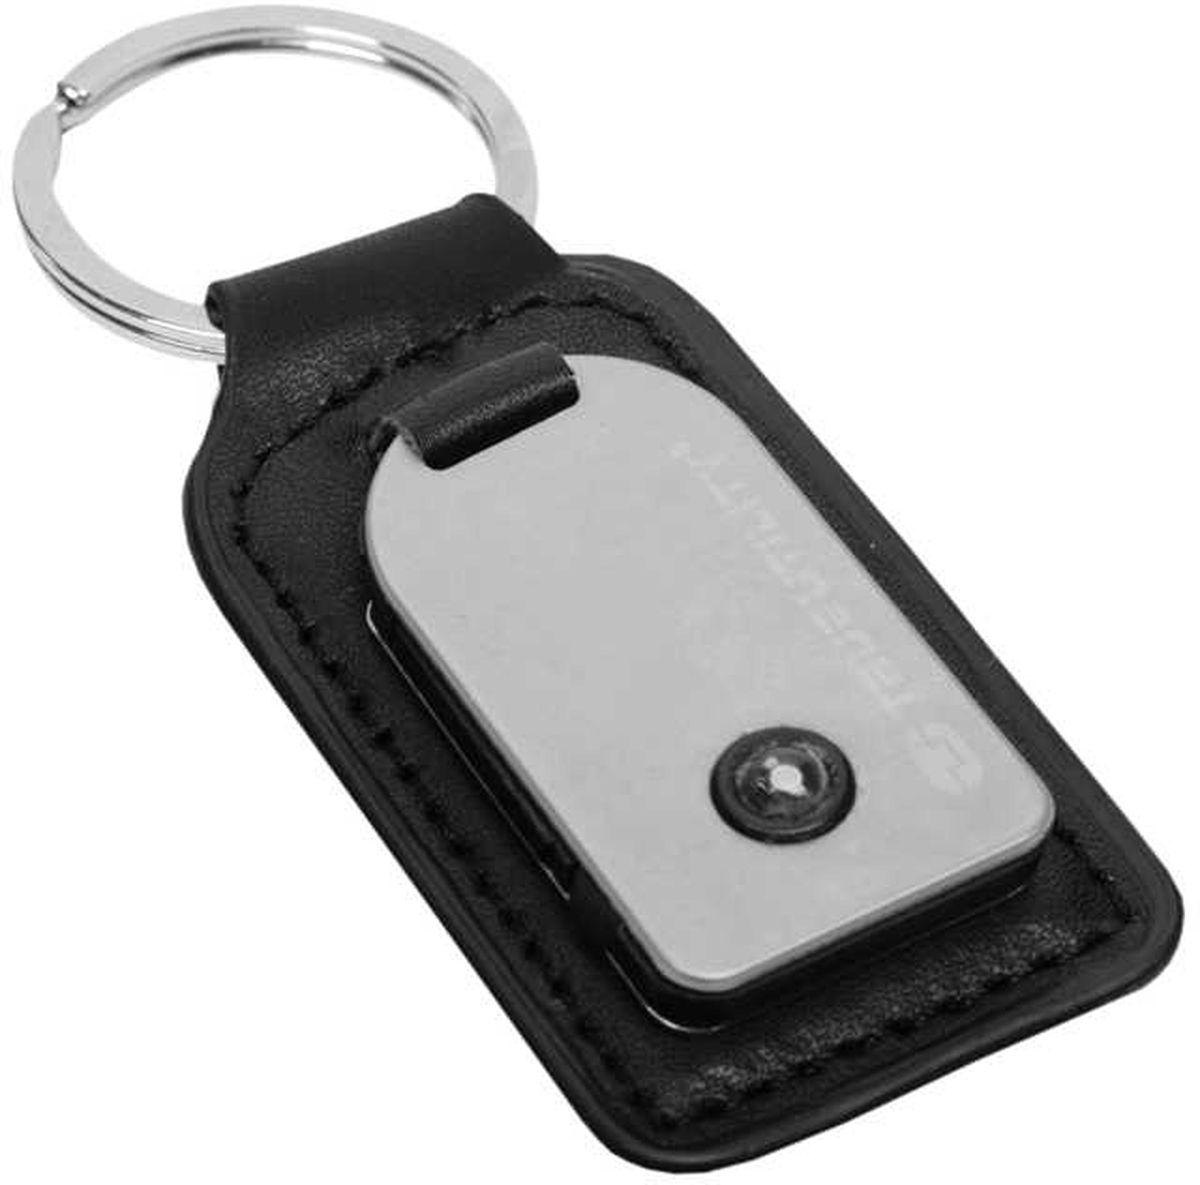 Брелок с фонариком True Utility  Leather FobLite Black  - Аксессуары для путешествий